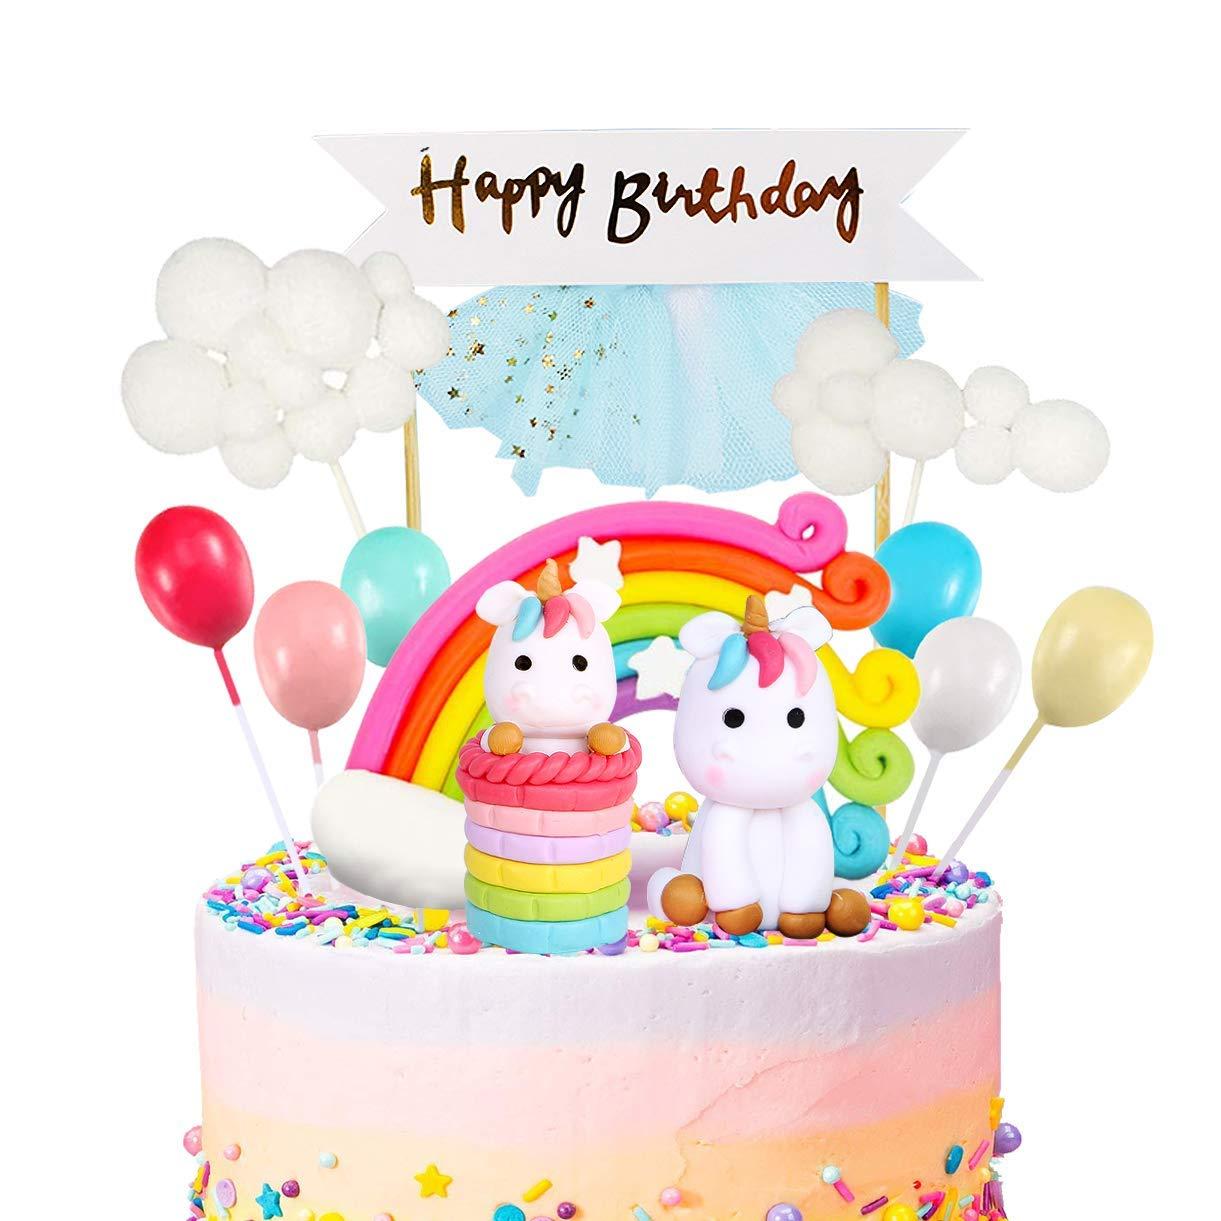 MOVINPE Unicorn Cake Topper Kit Cloud Rainbow Balloon Happy Birthday Banner Cake Decoration Pack of 12 For Boys Girls Kids Birthday